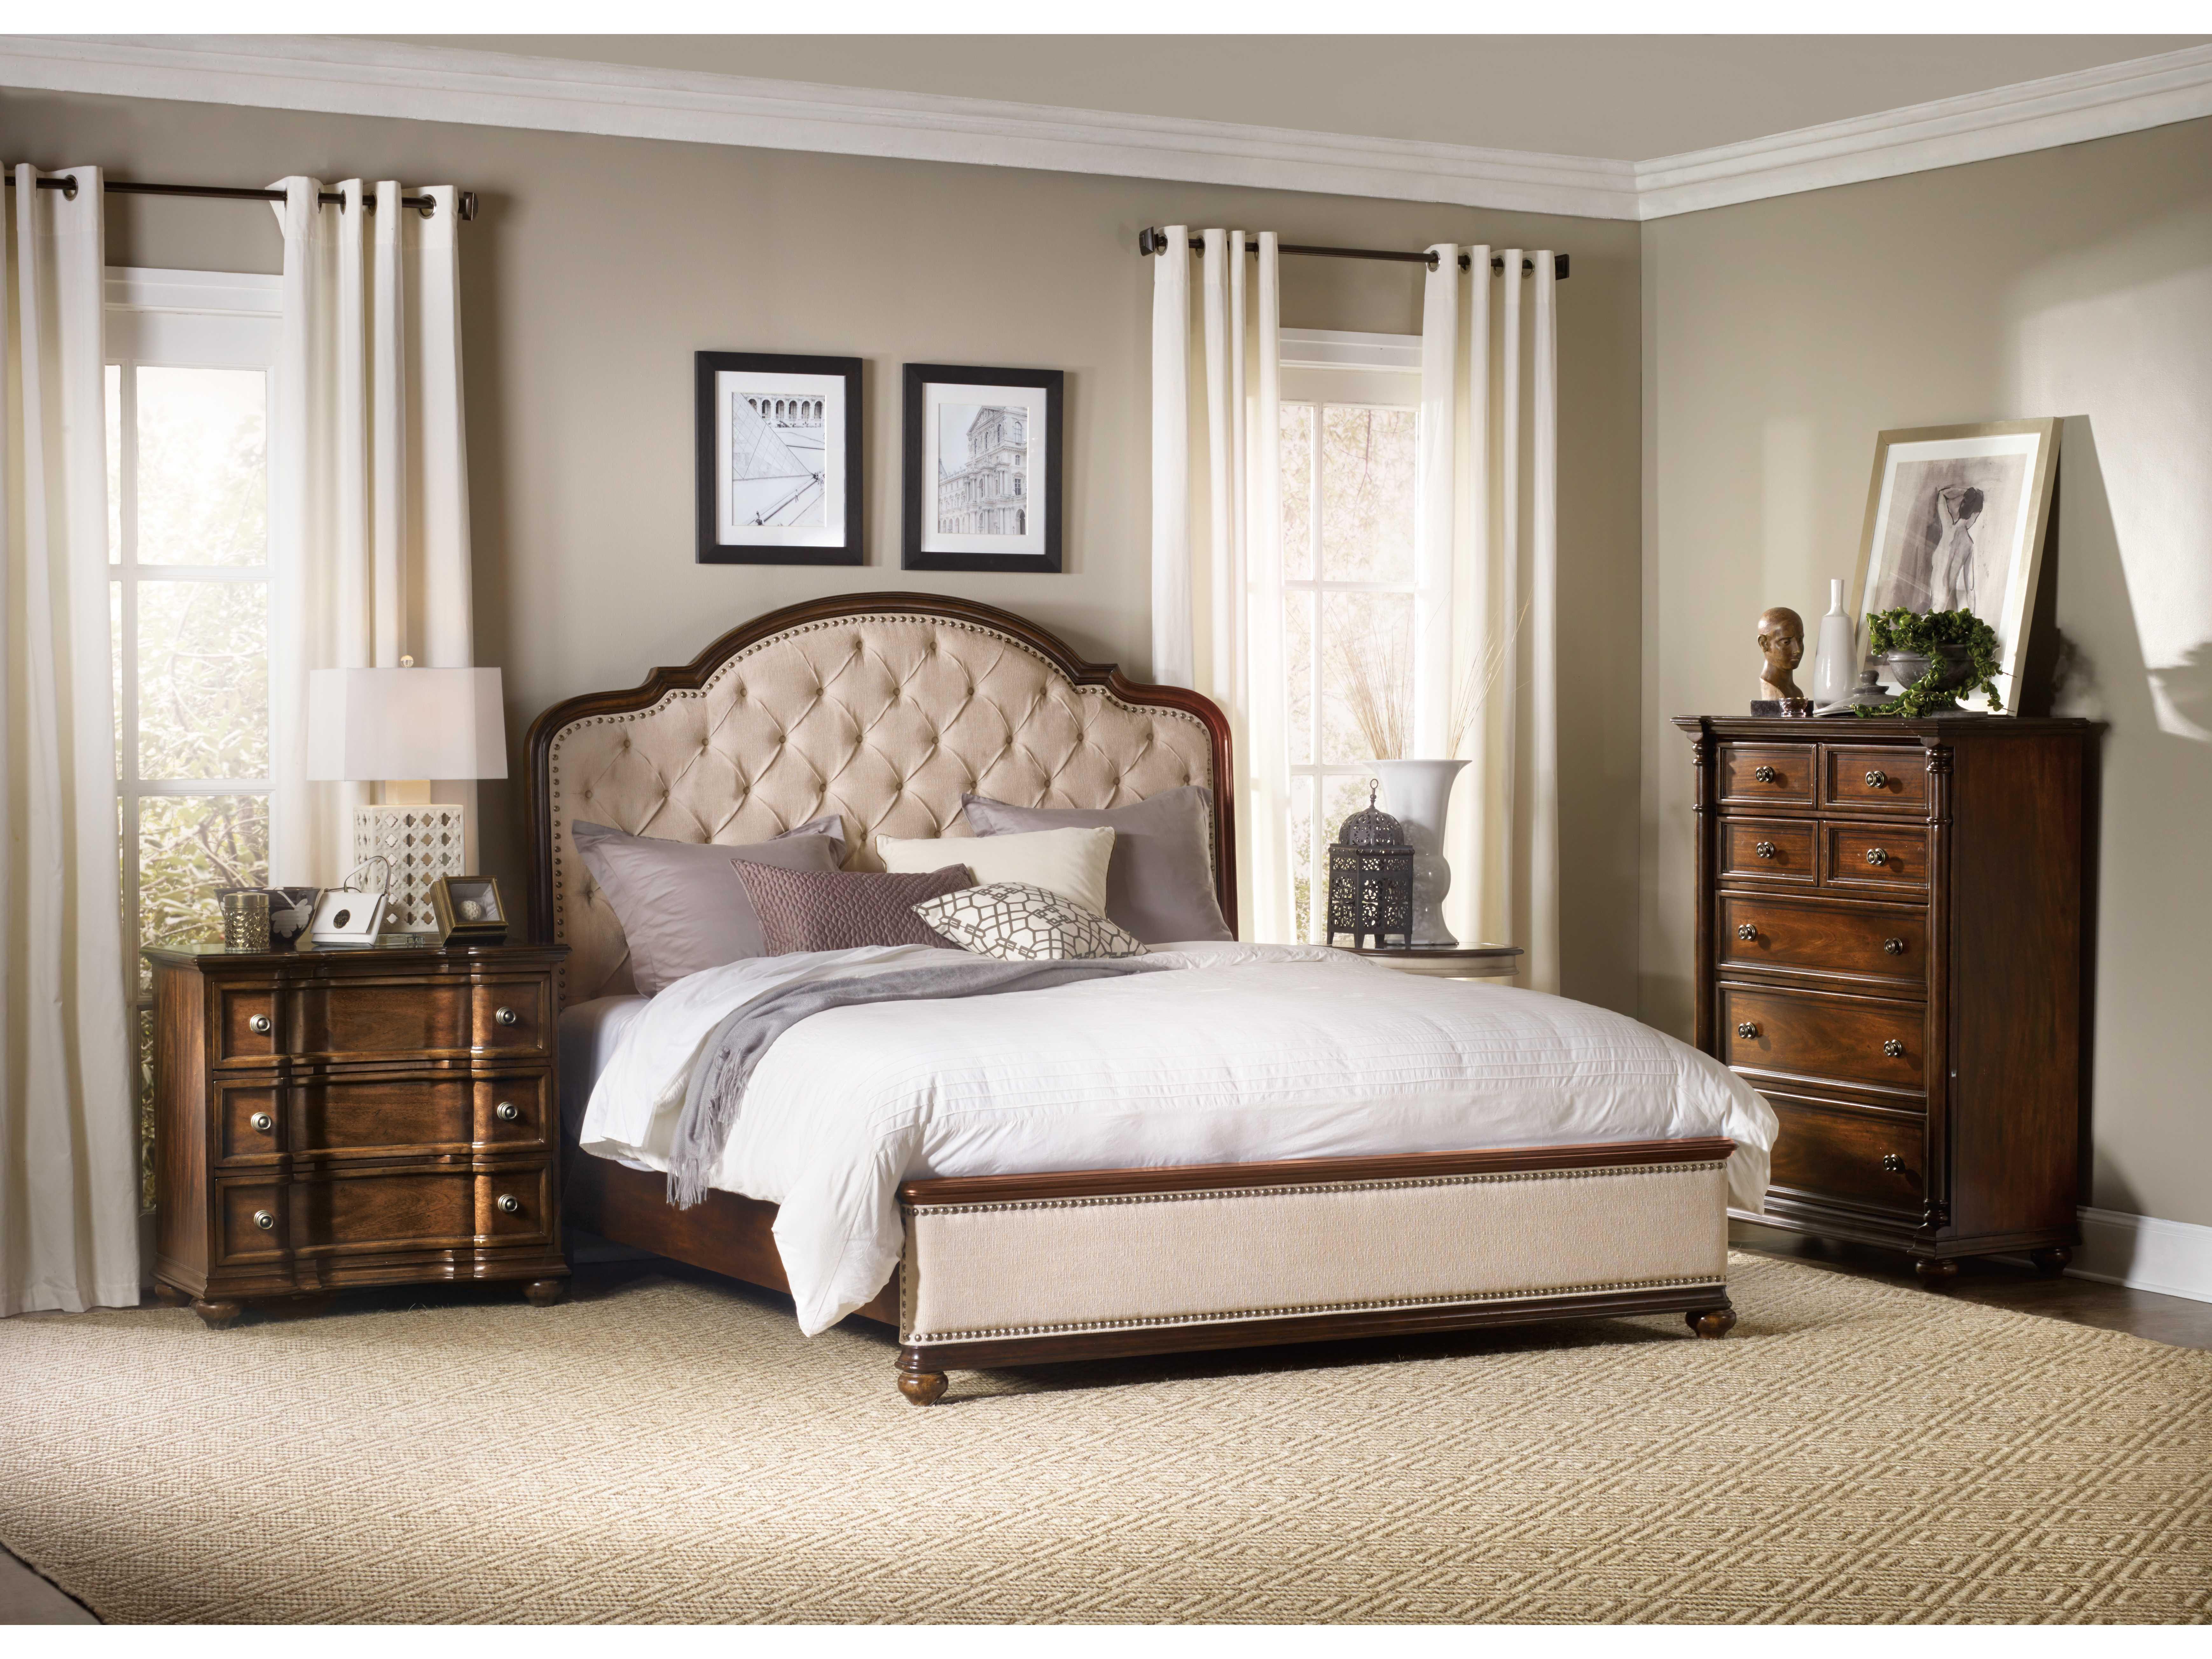 Hooker Furniture Leesburg Rich Traditional Mahogany Queen